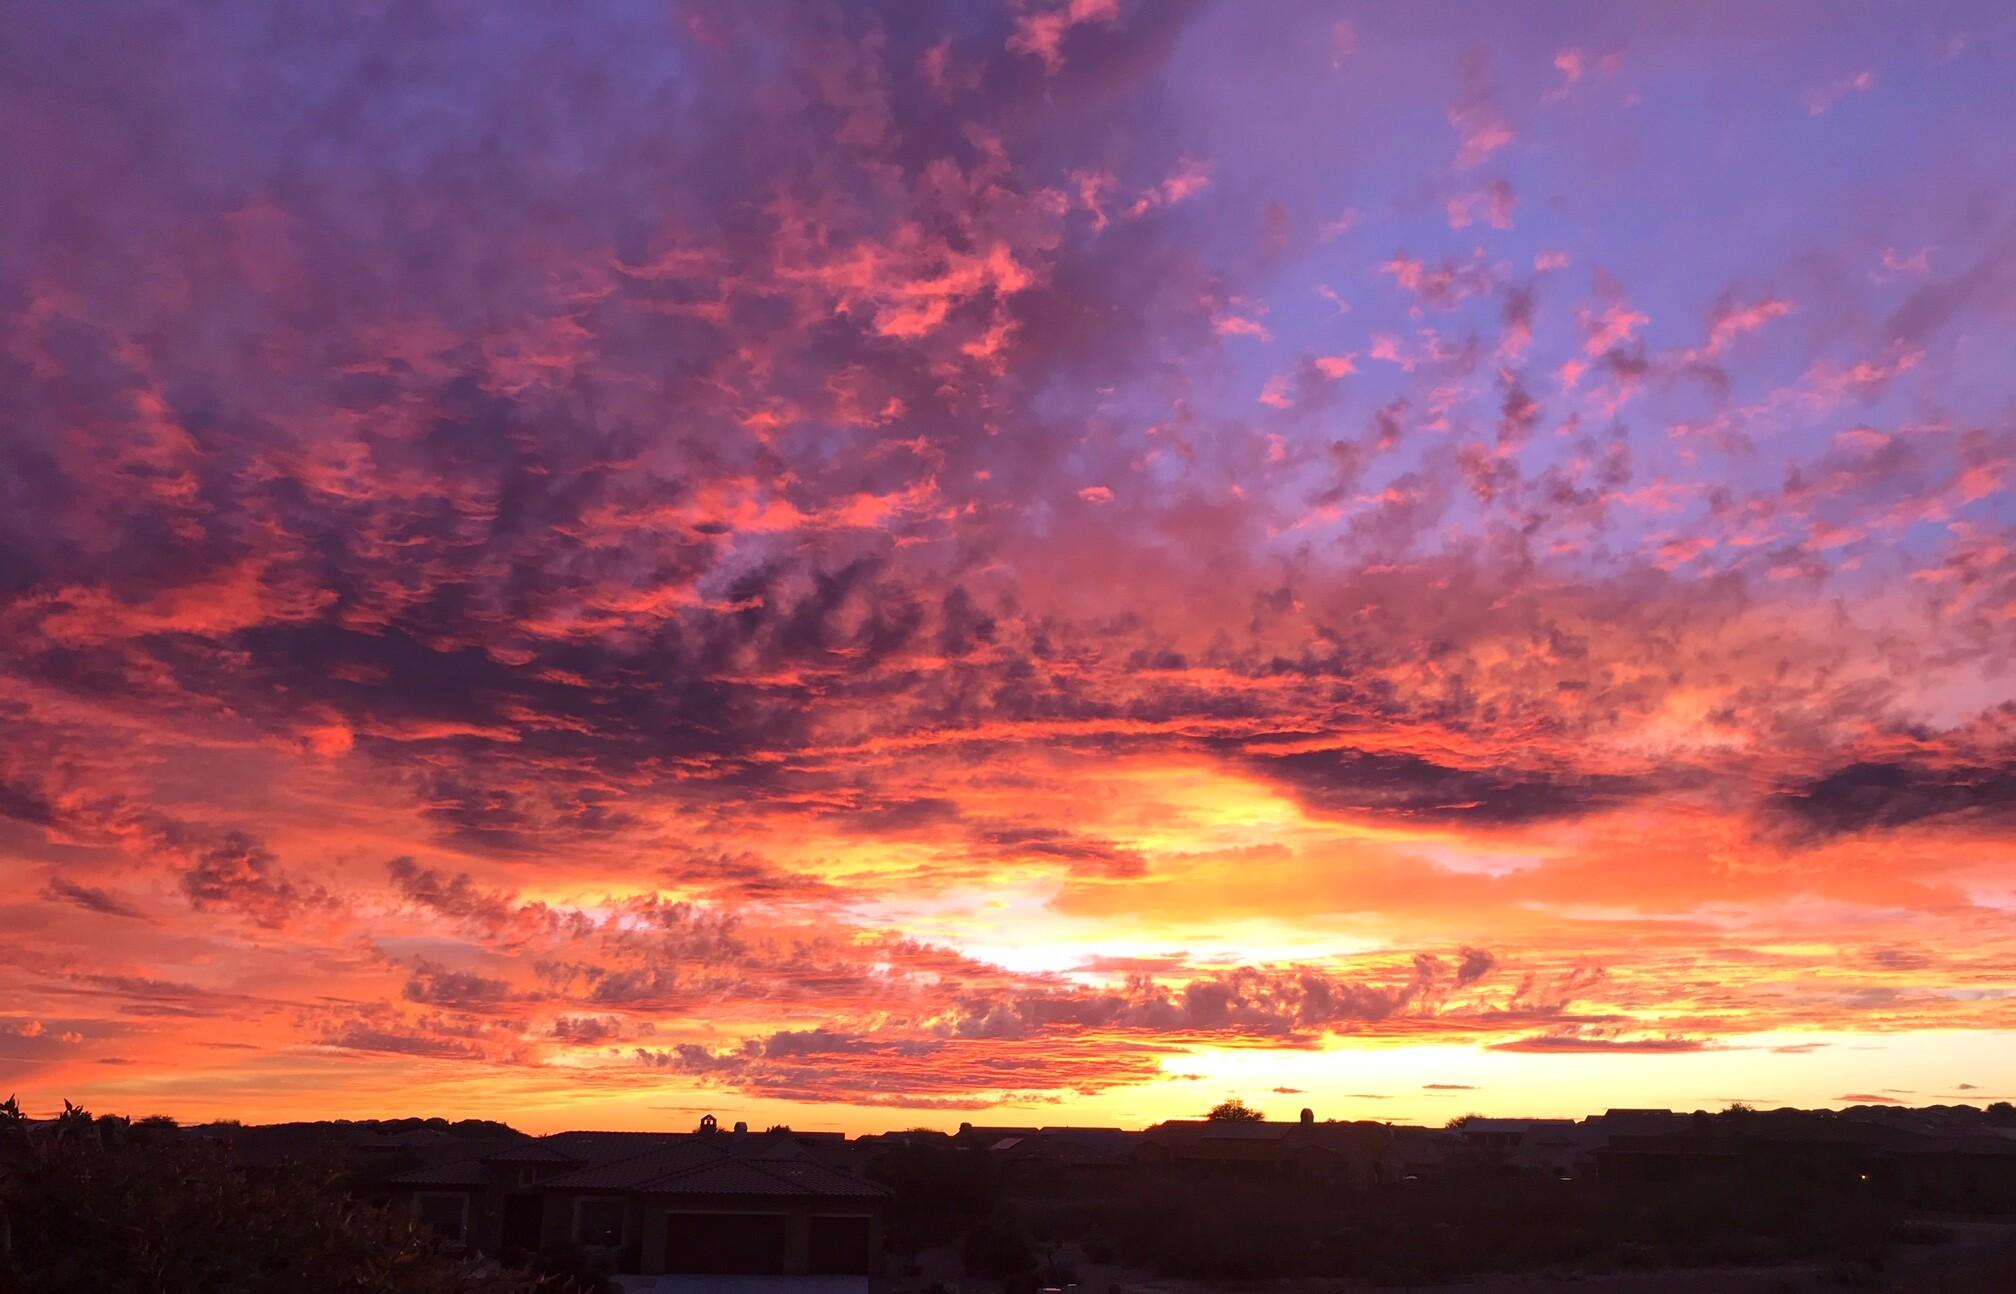 EJ Kula Tucson Sunset in Saddle Brooke JAN 10.jpg